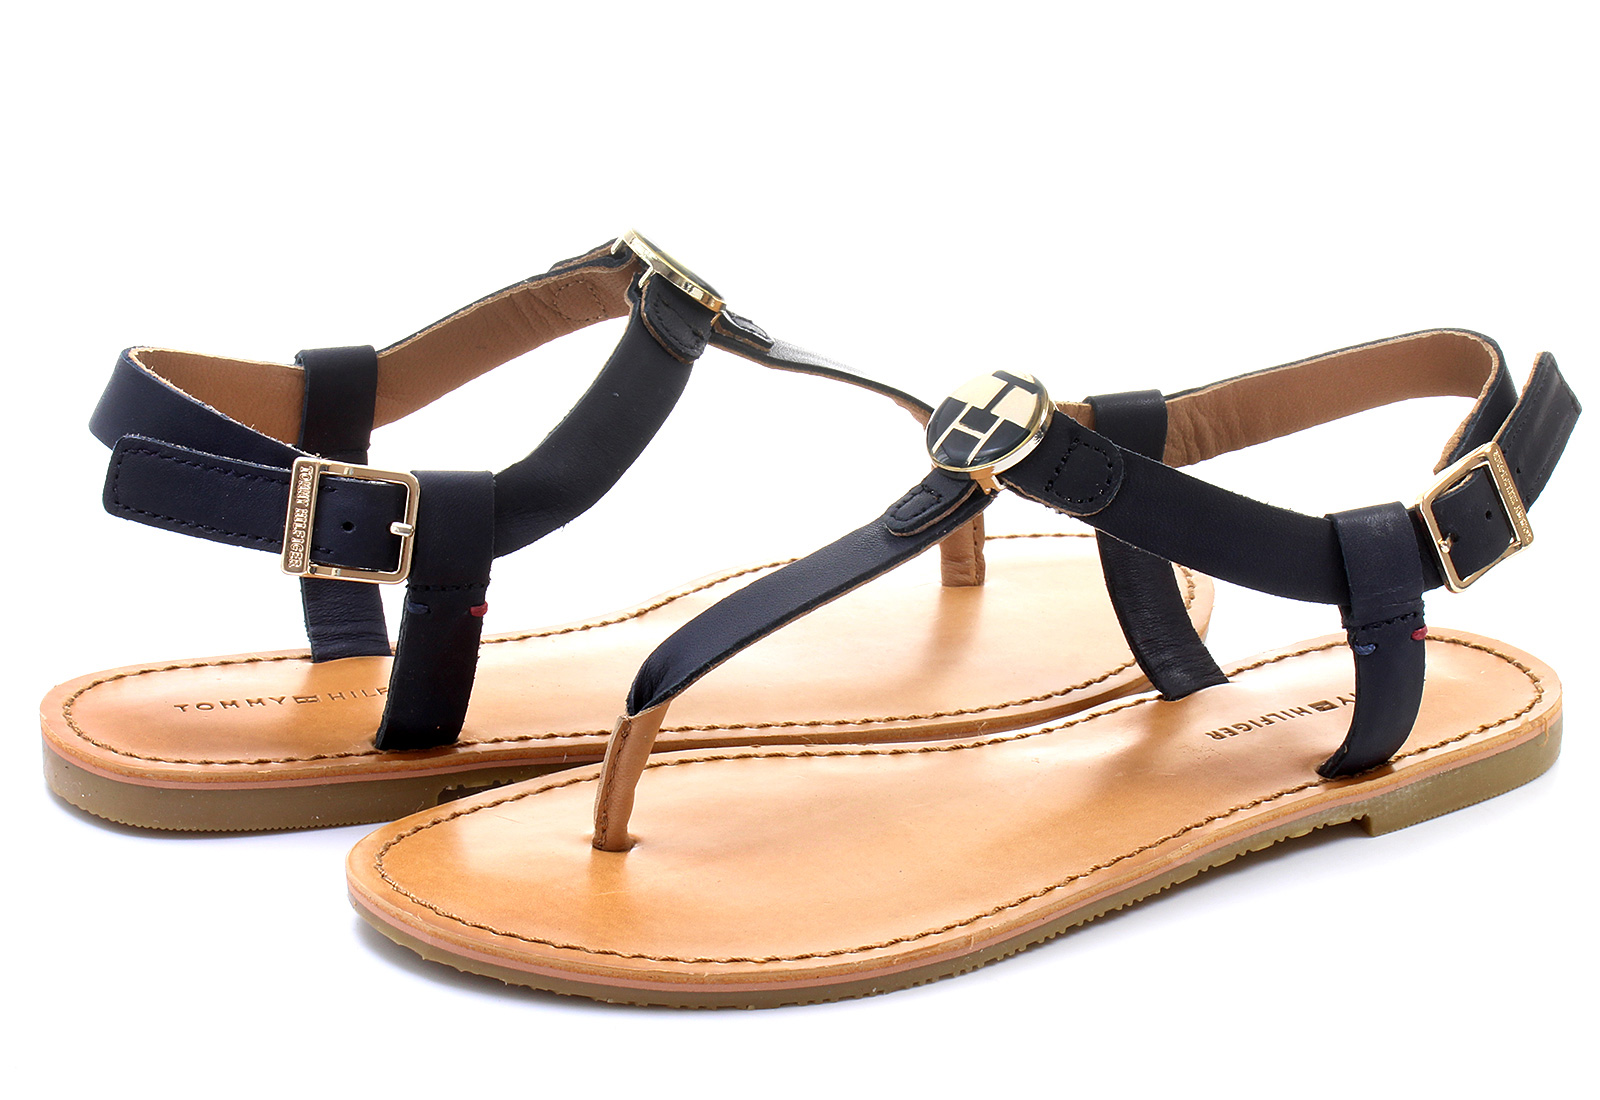 feea8389f9d Tommy Hilfiger Sandals - Julia 26a - 14S-6798-403 - Online shop for ...